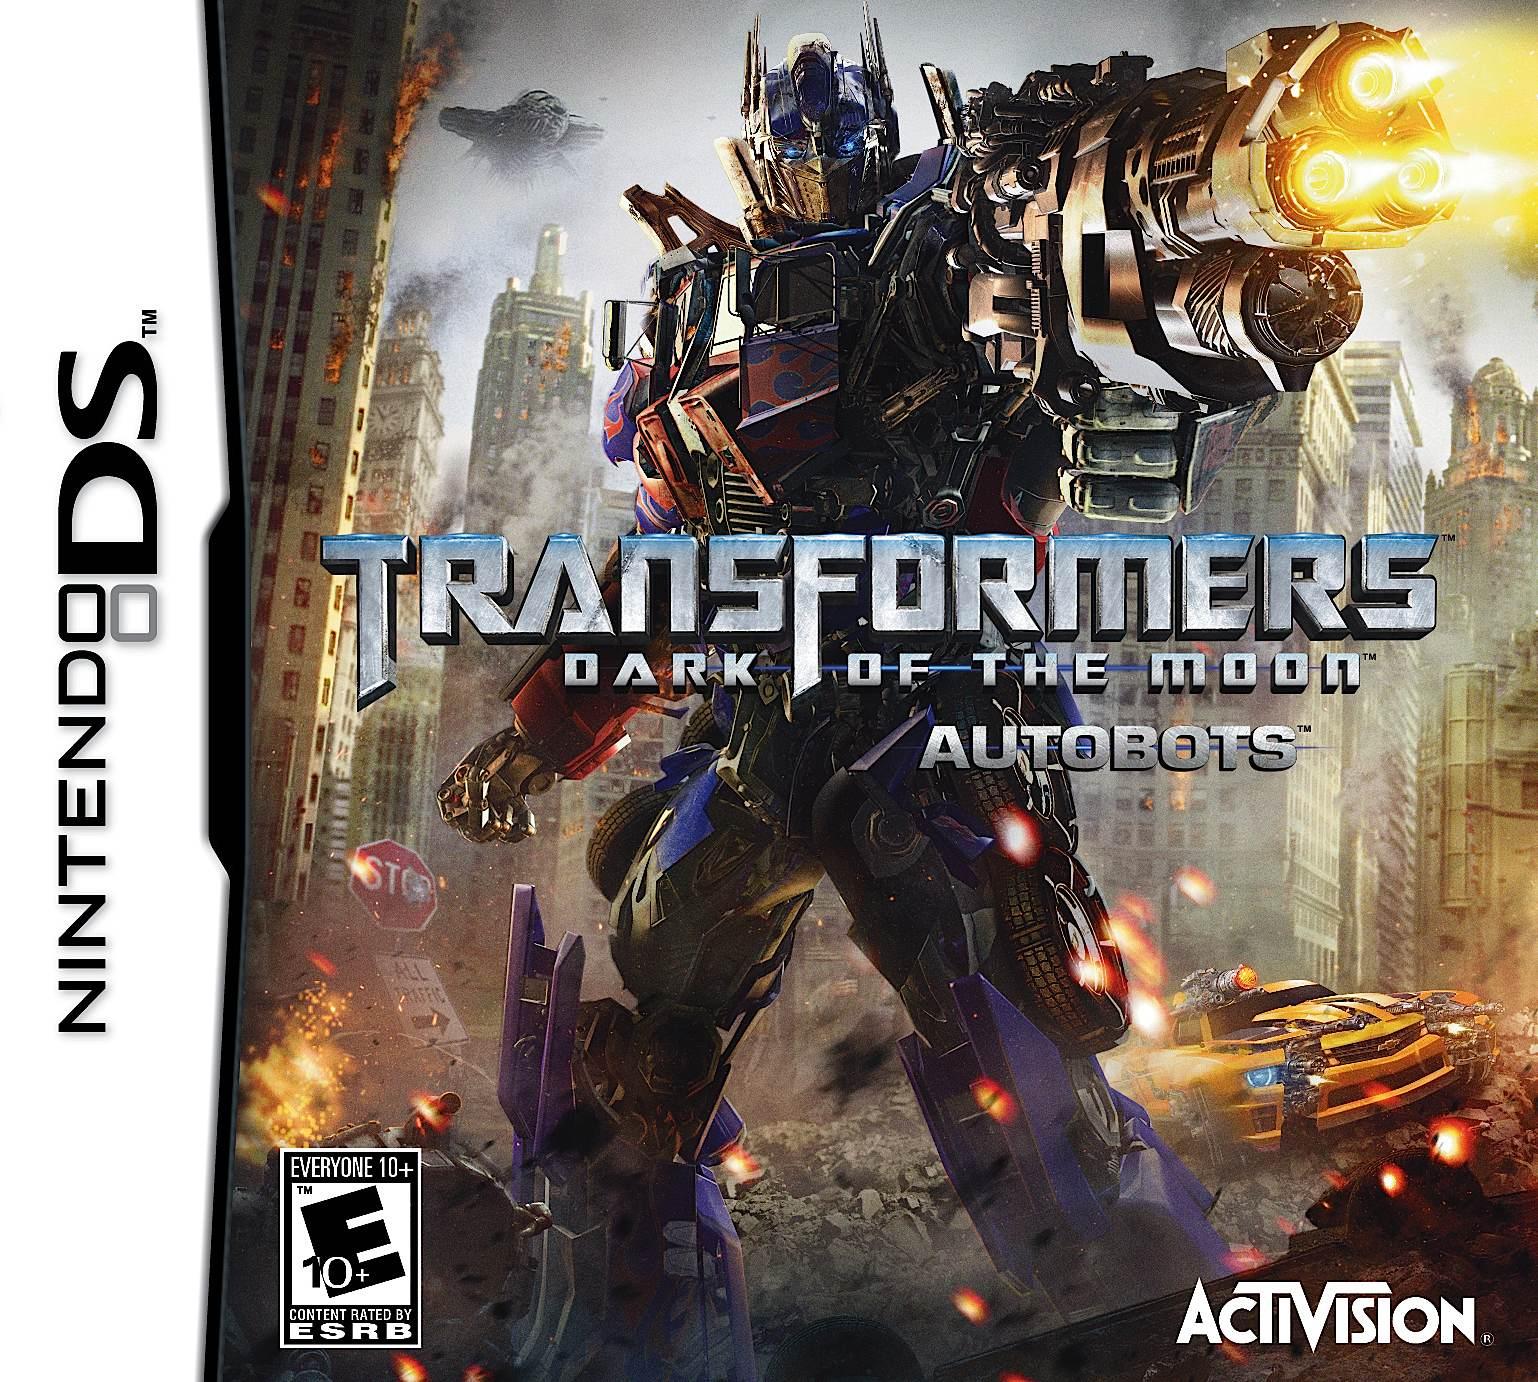 Obrázky z Transformers: Dark of the Moon 39579